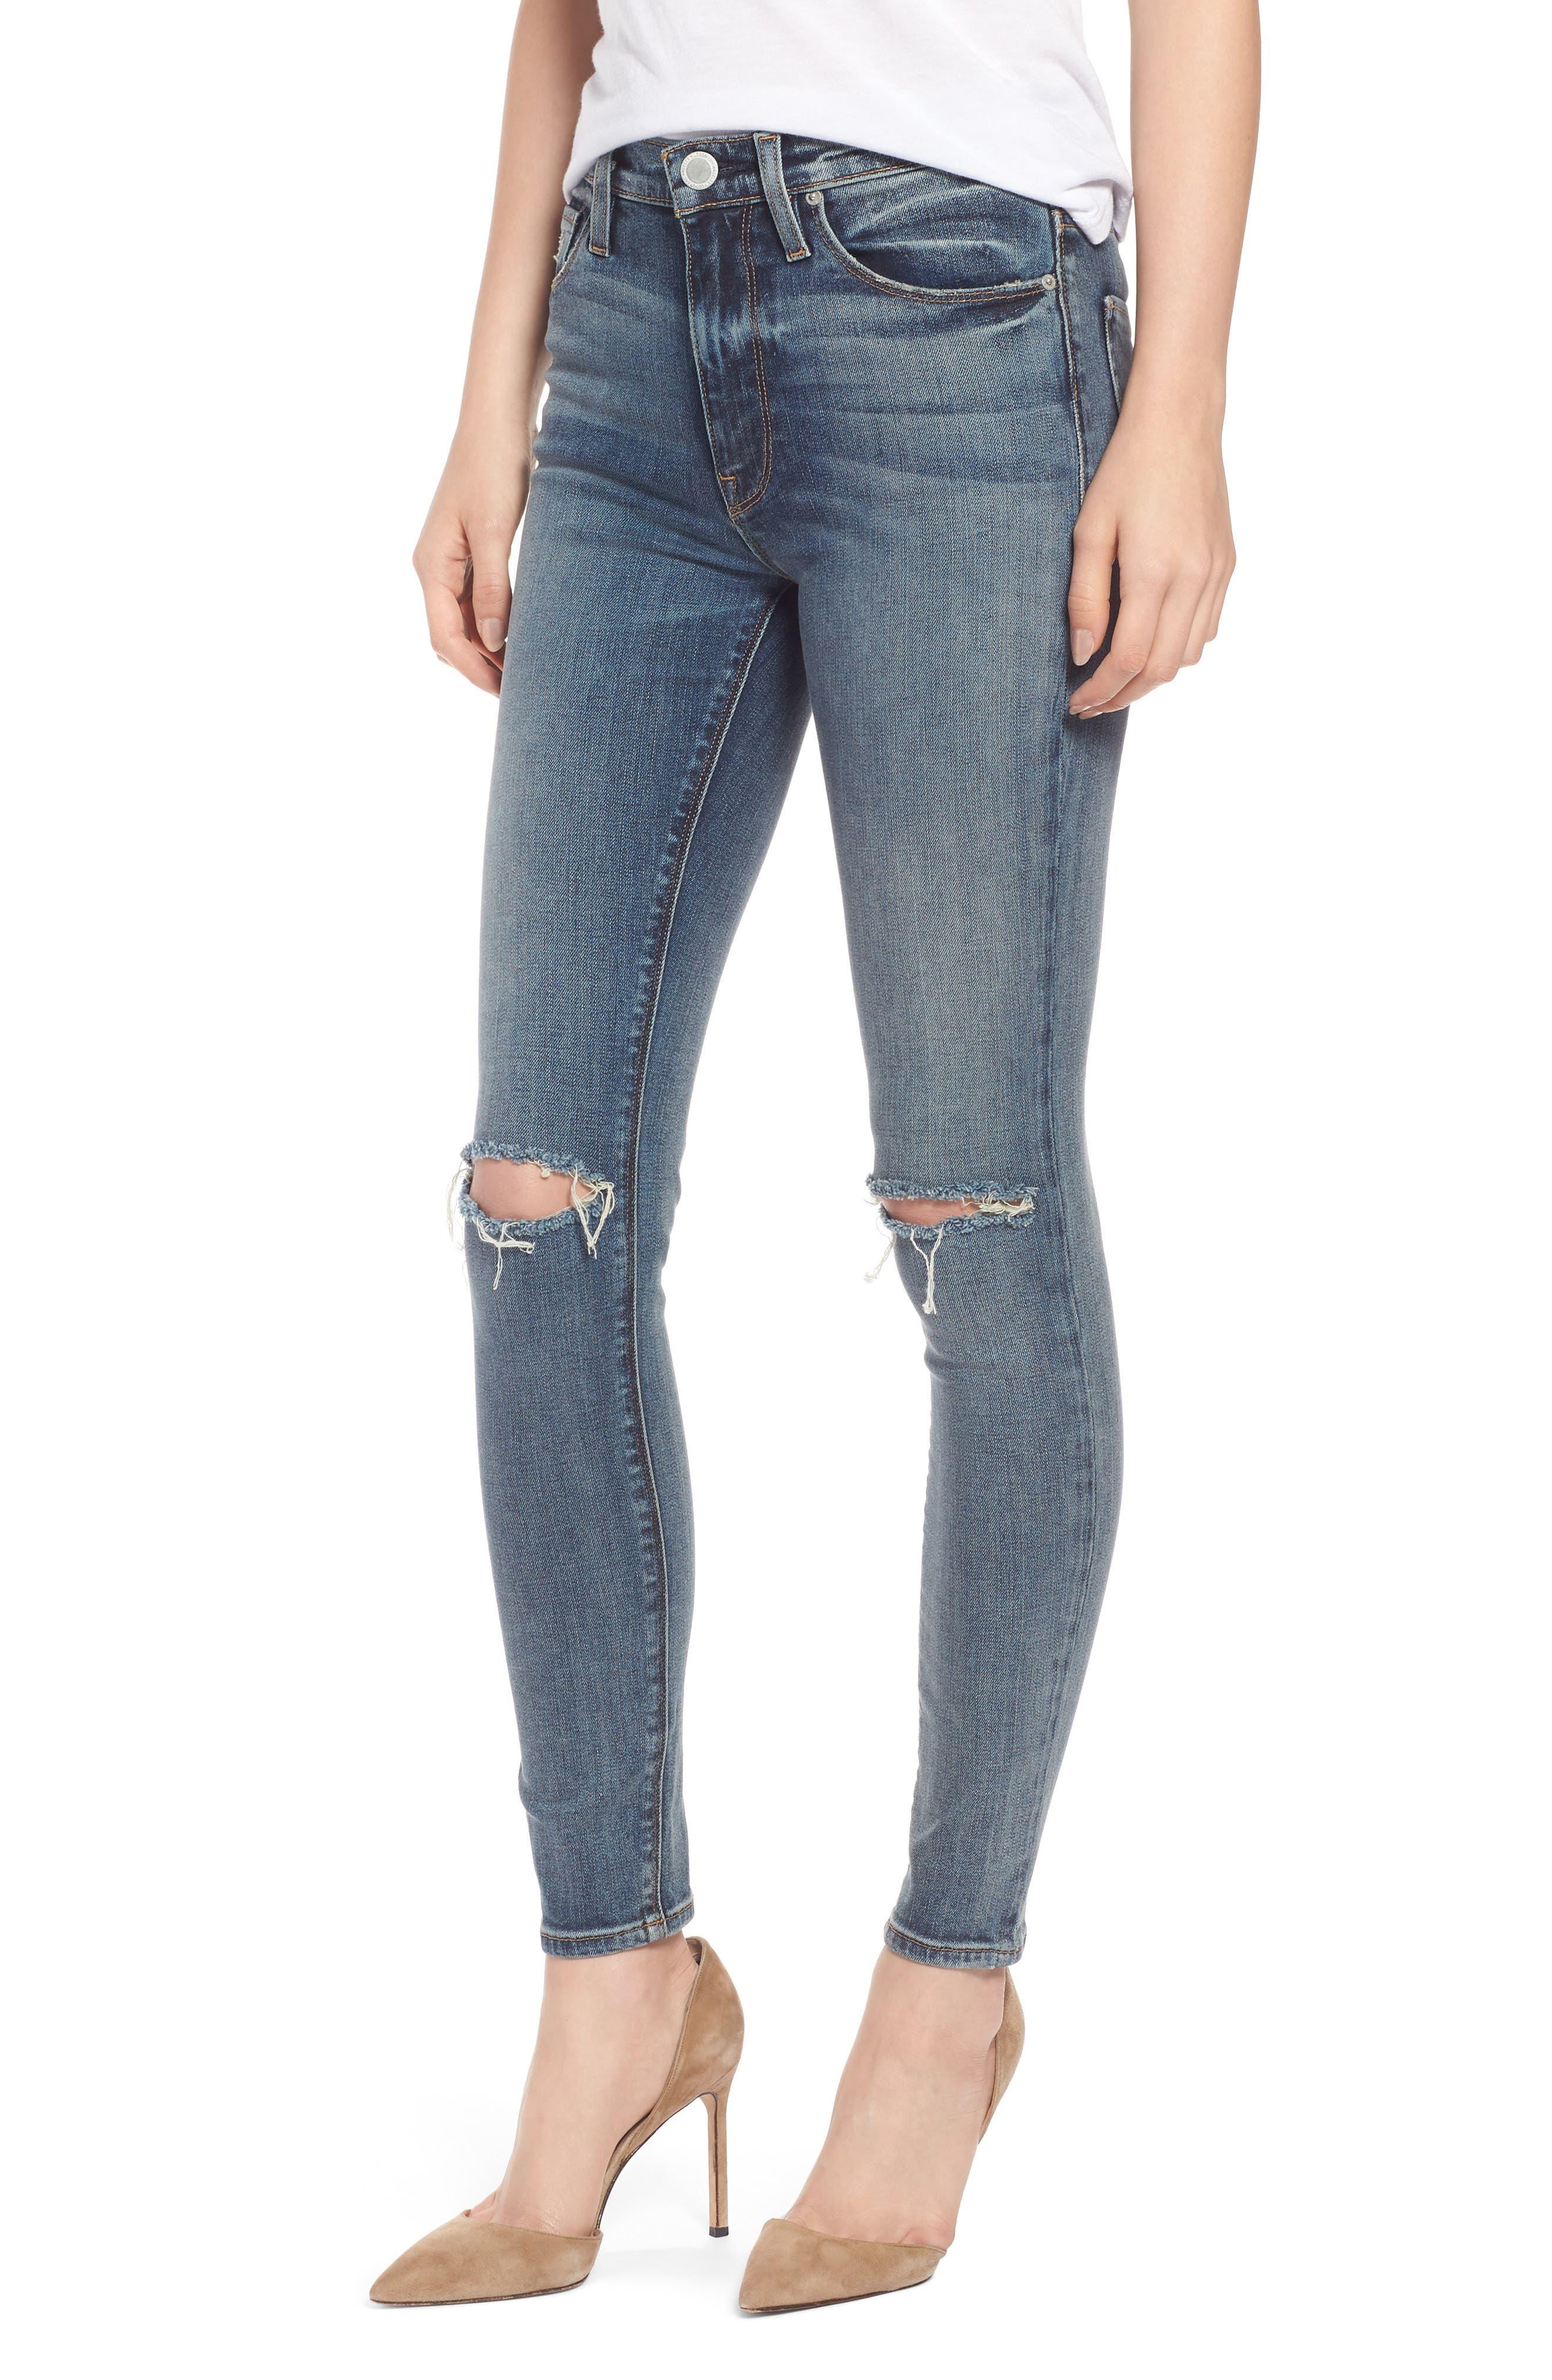 Barbara High Waist Super Skinny Jeans,                             Main thumbnail 1, color,                             COLIMA ROAD